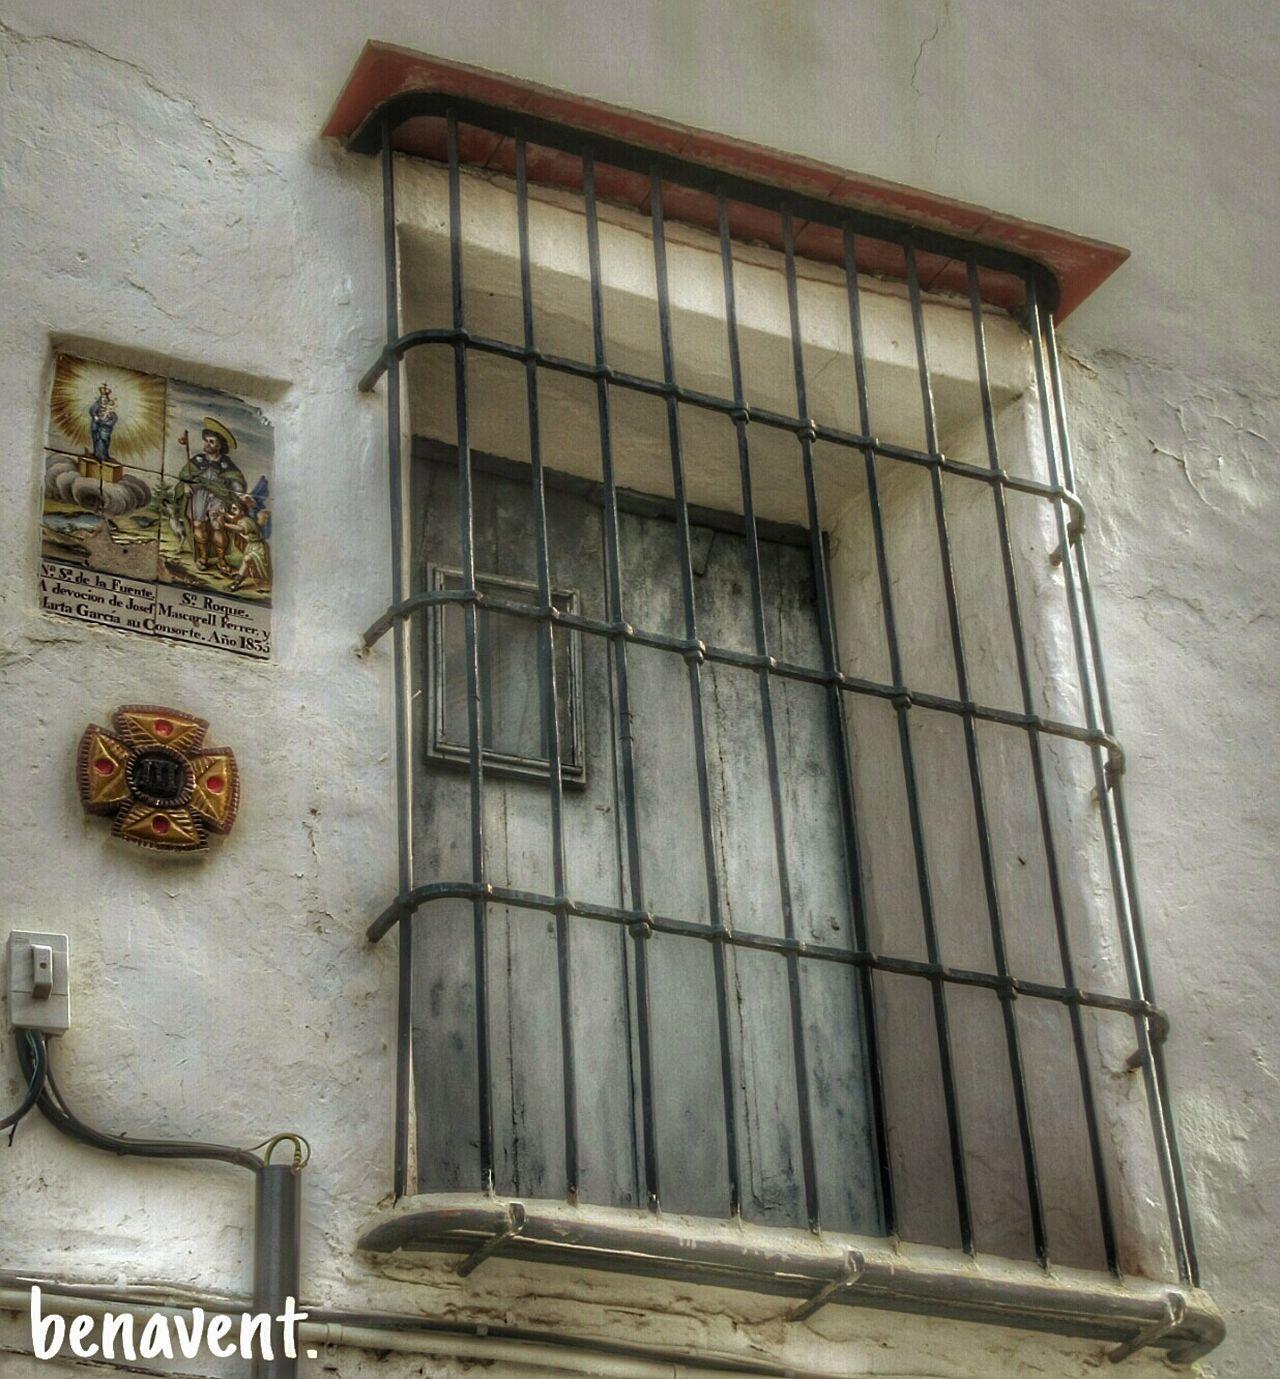 Finestra Finestres Ventana Ventanas Puertas Y Ventanas Villalonga La Safor País De L'olivera Sóc De Poble Reixa Calvari Window Windows